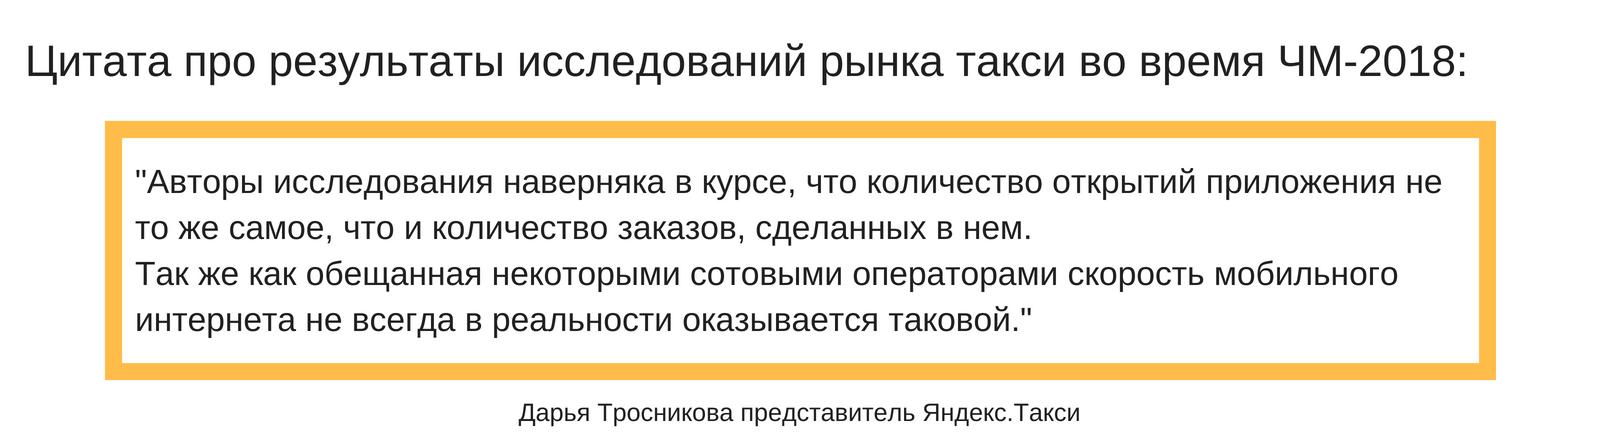 Комментарий Яндекс.Такси